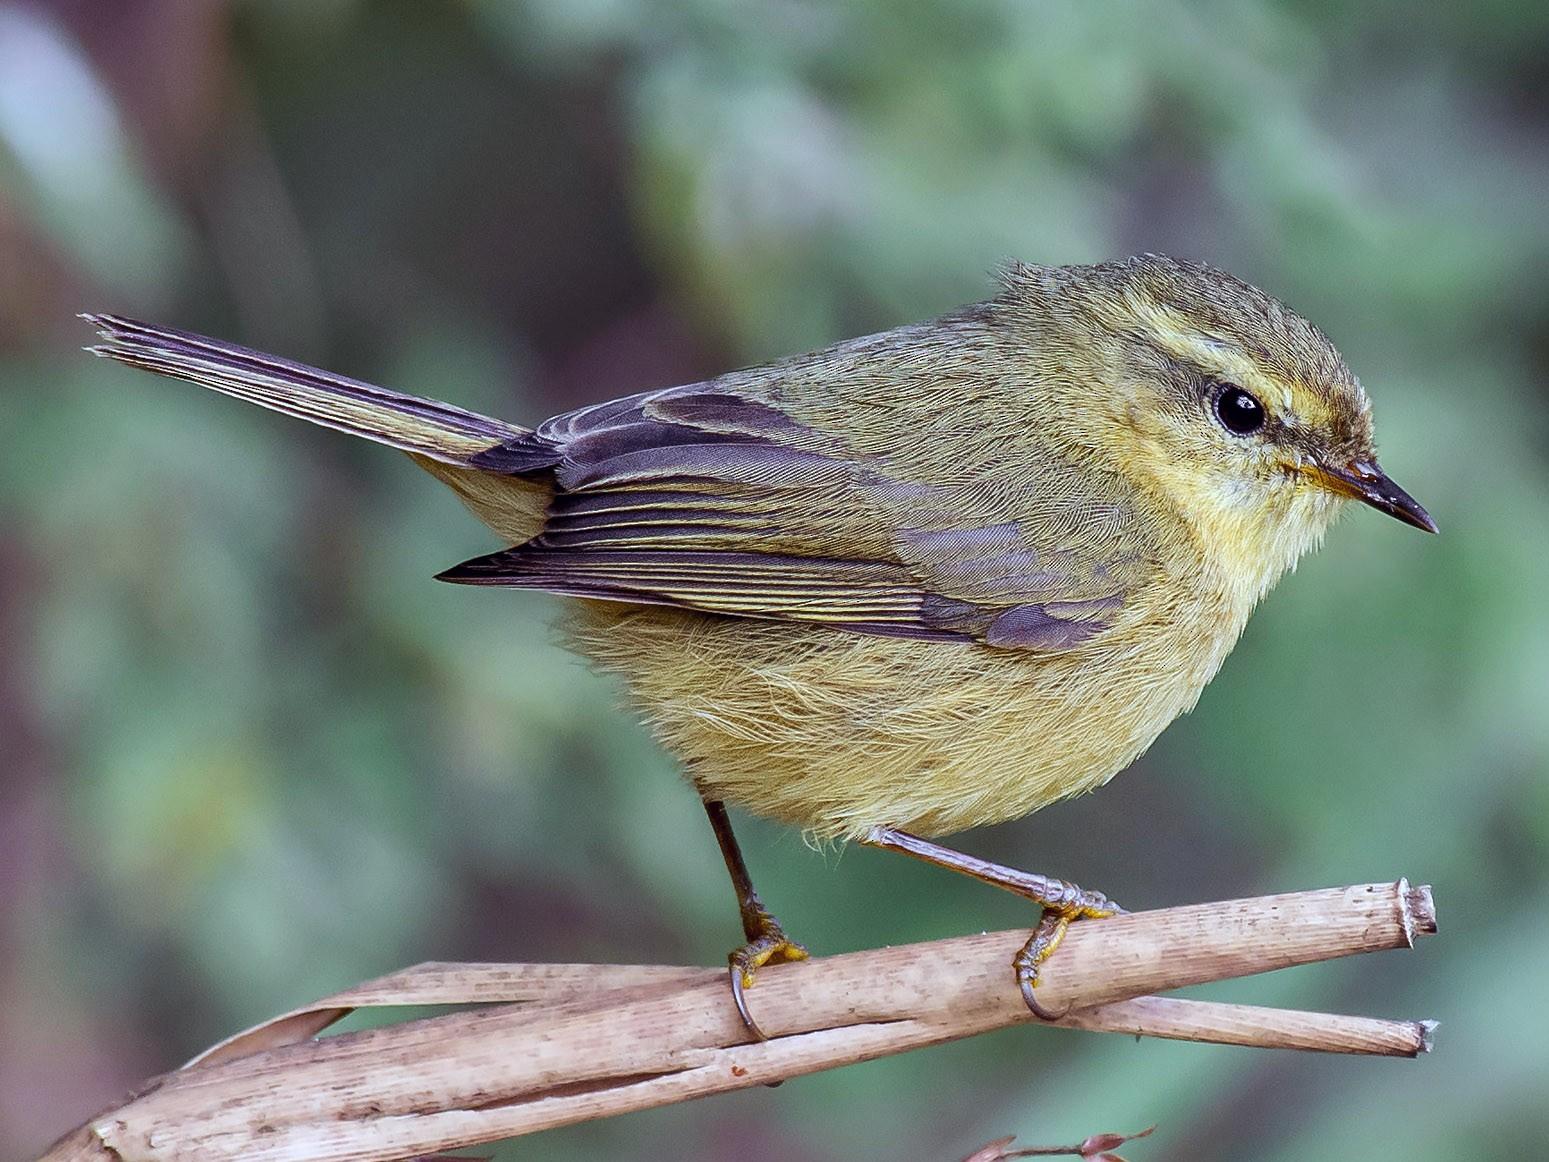 Buff-throated Warbler - Natthaphat Chotjuckdikul